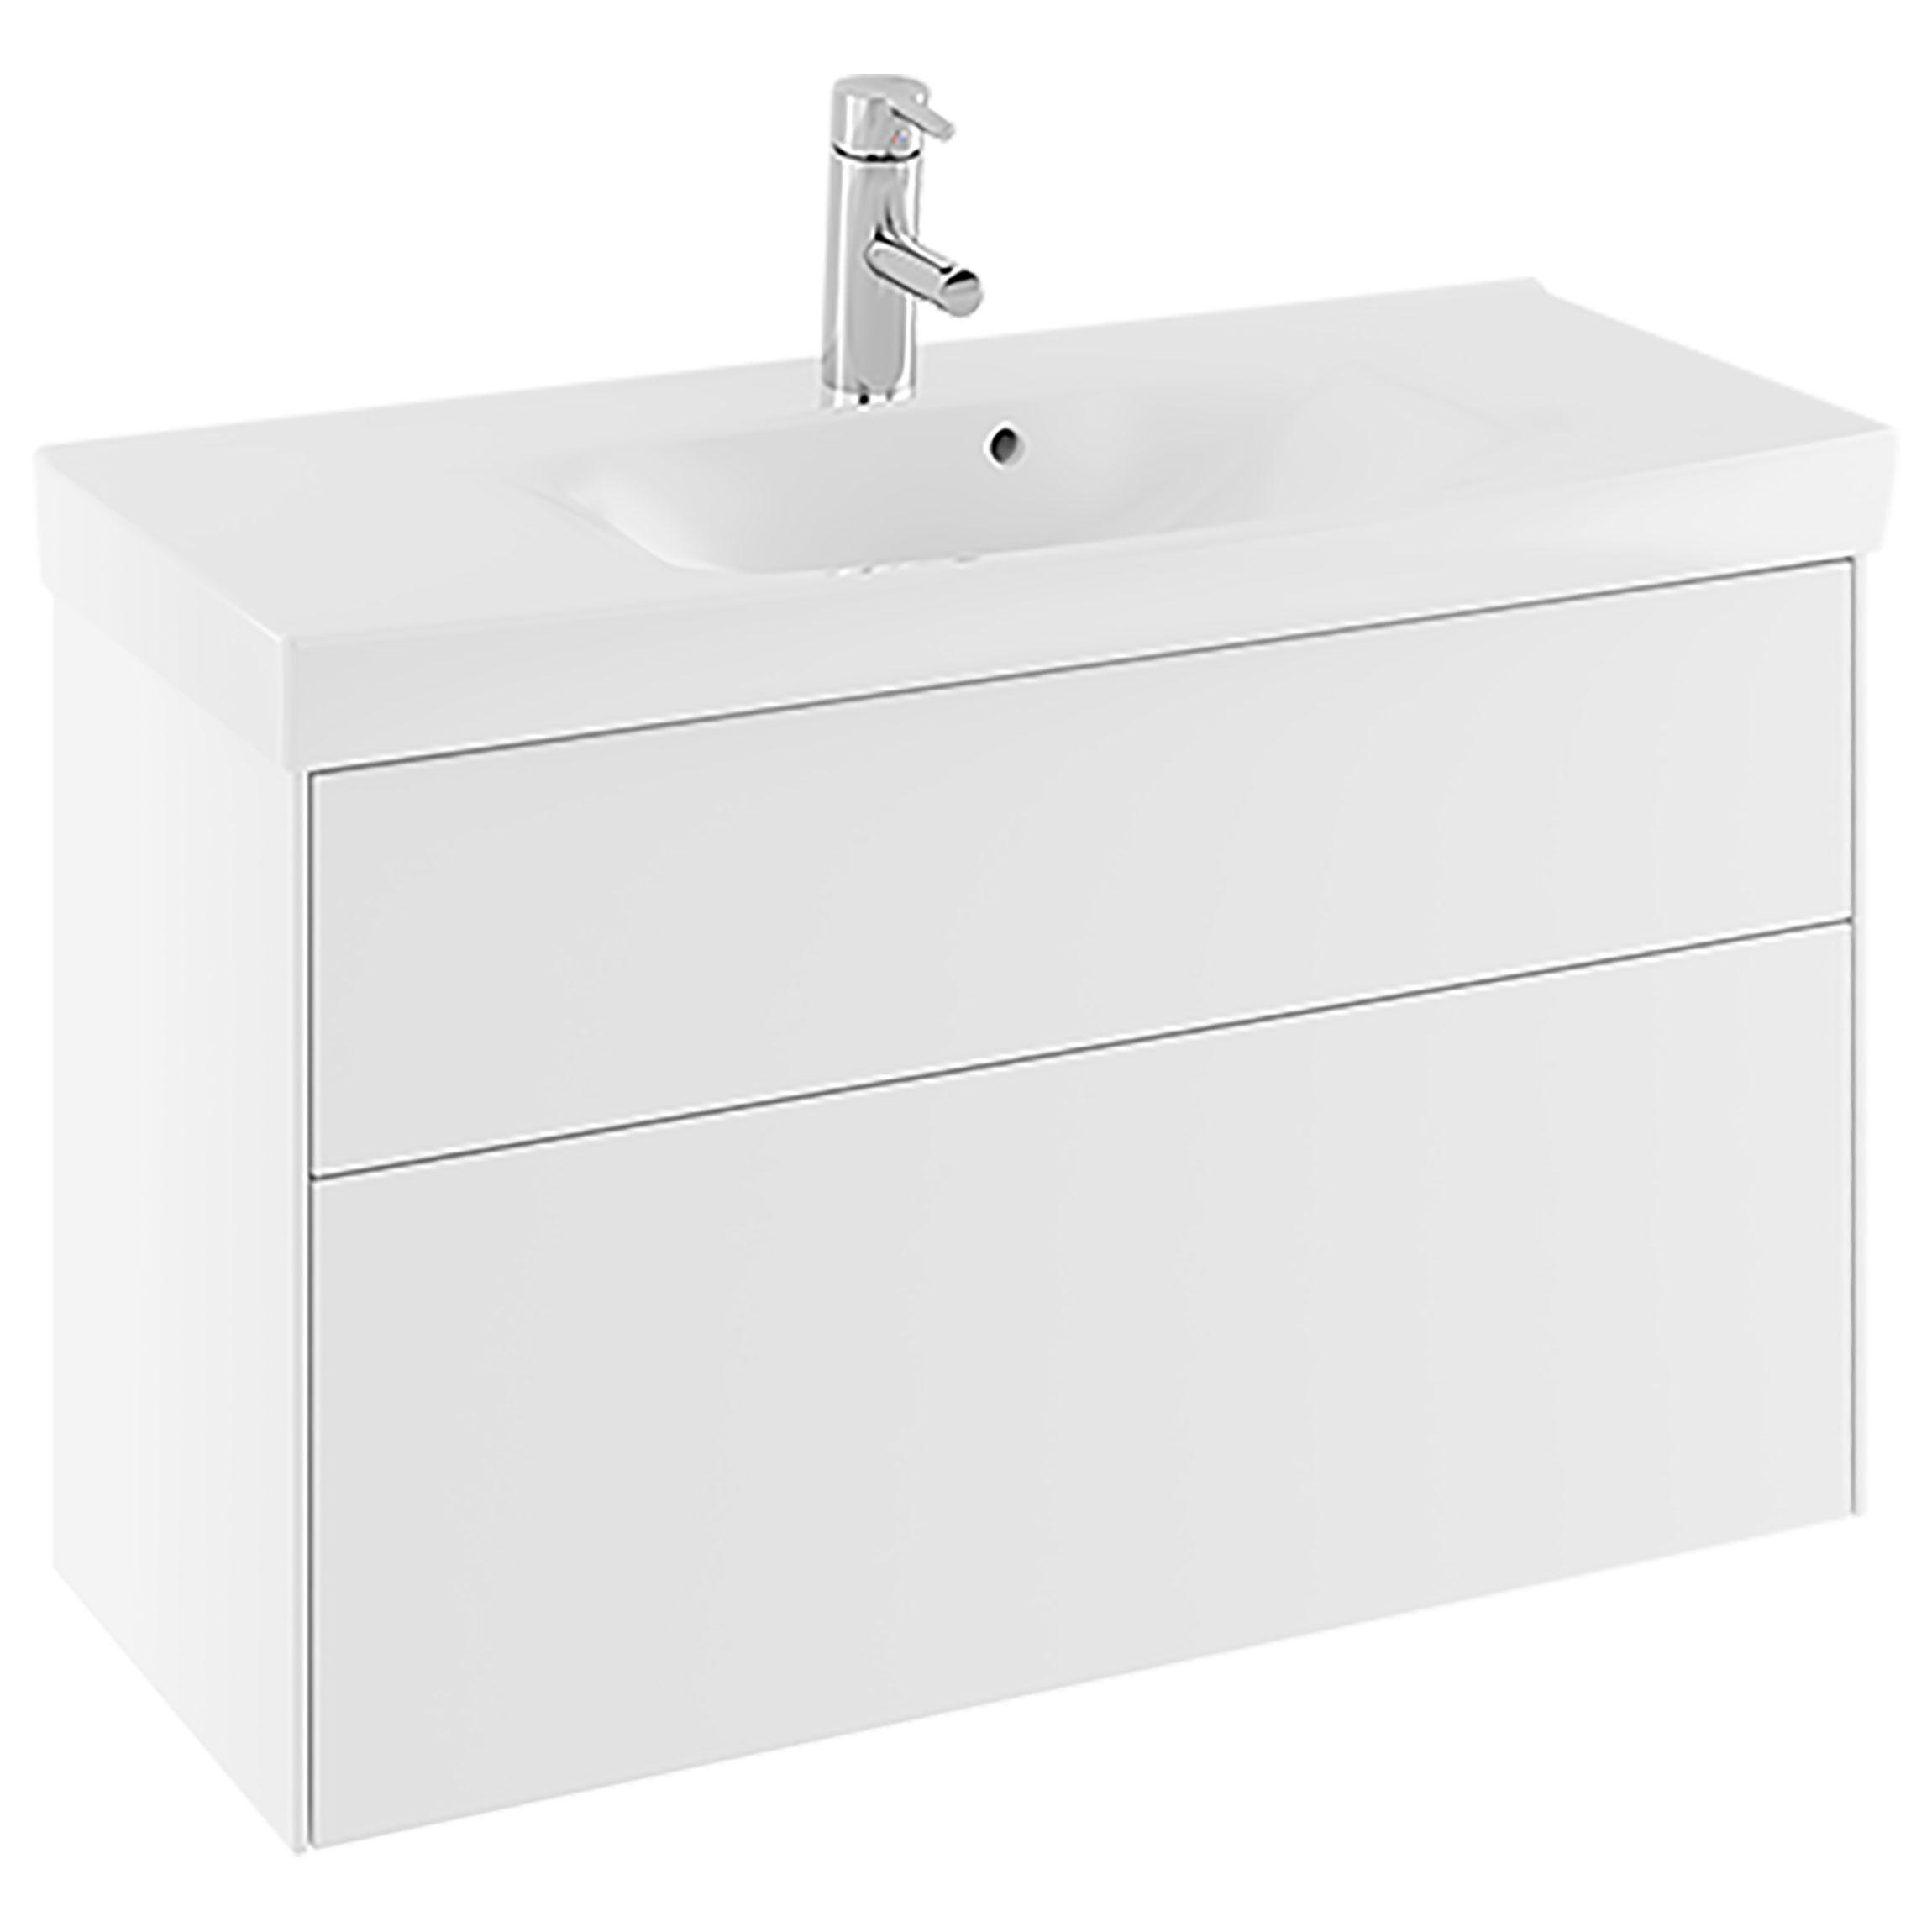 Tvättställsskåp Ifö Sense 90 Compact